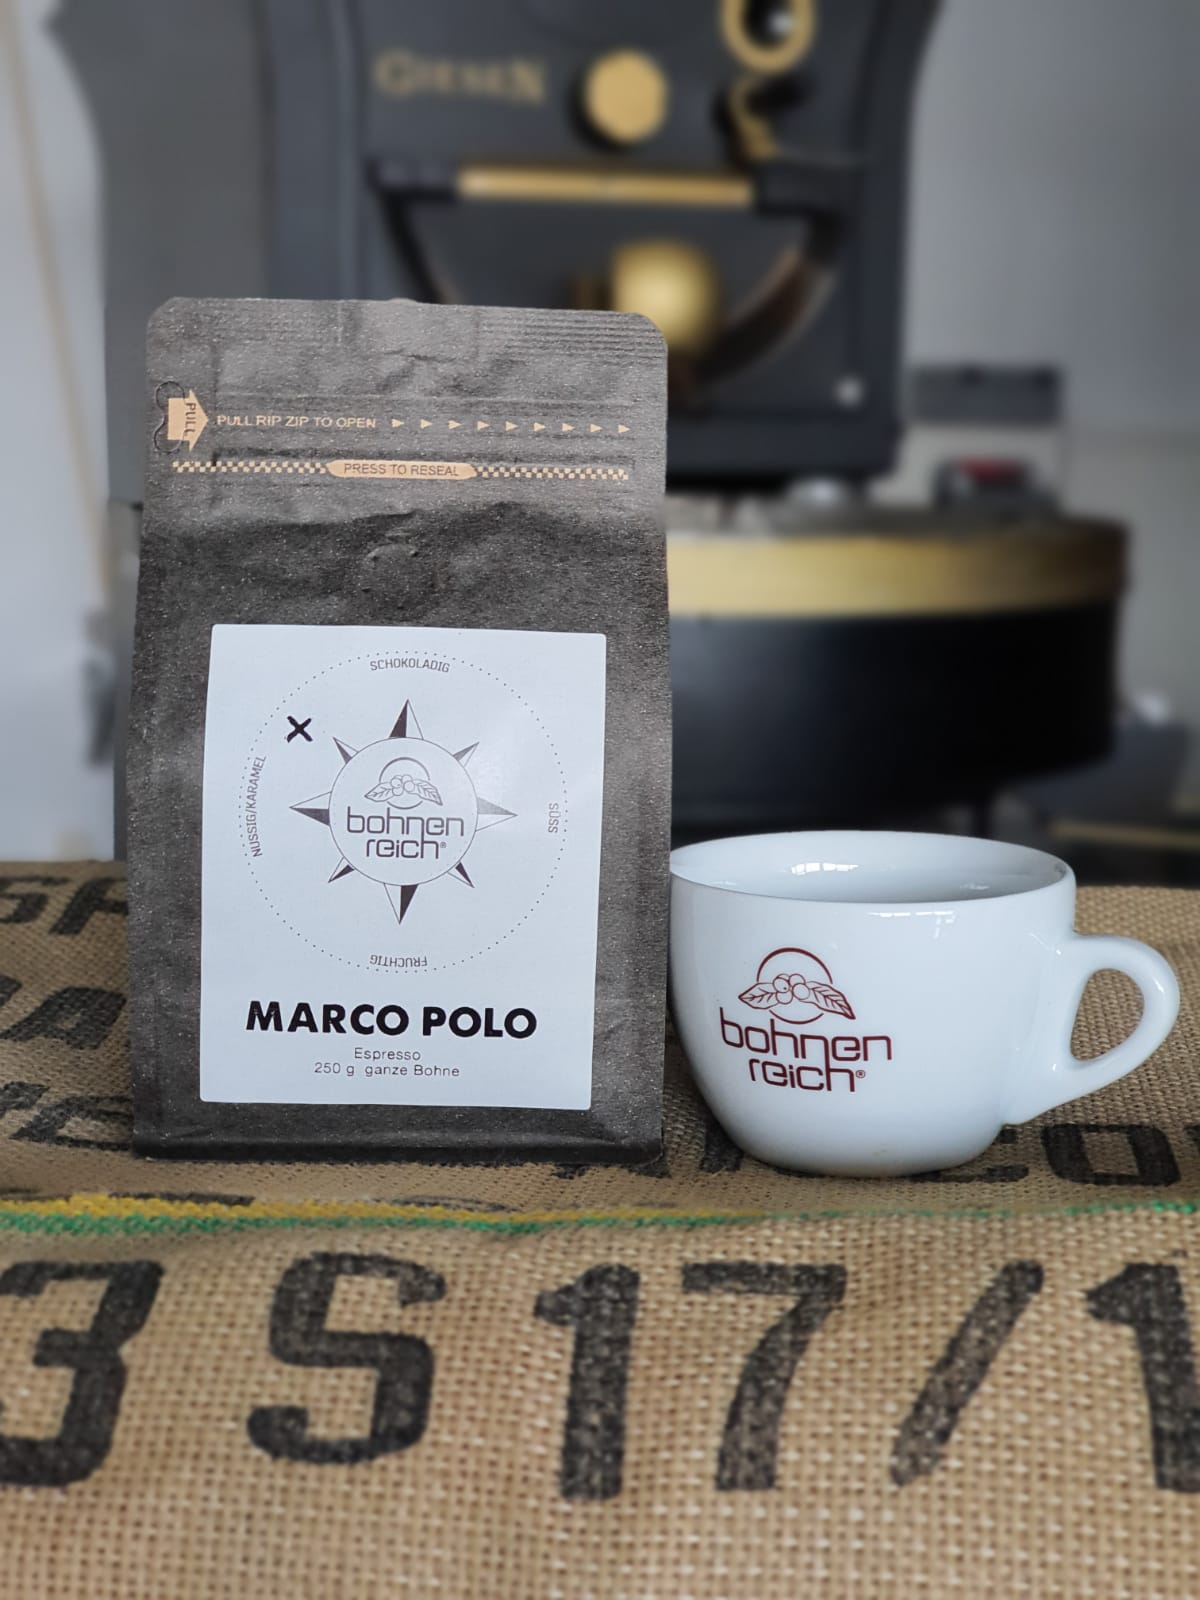 Bohnenreich Marco Polo Espresso 1 kg